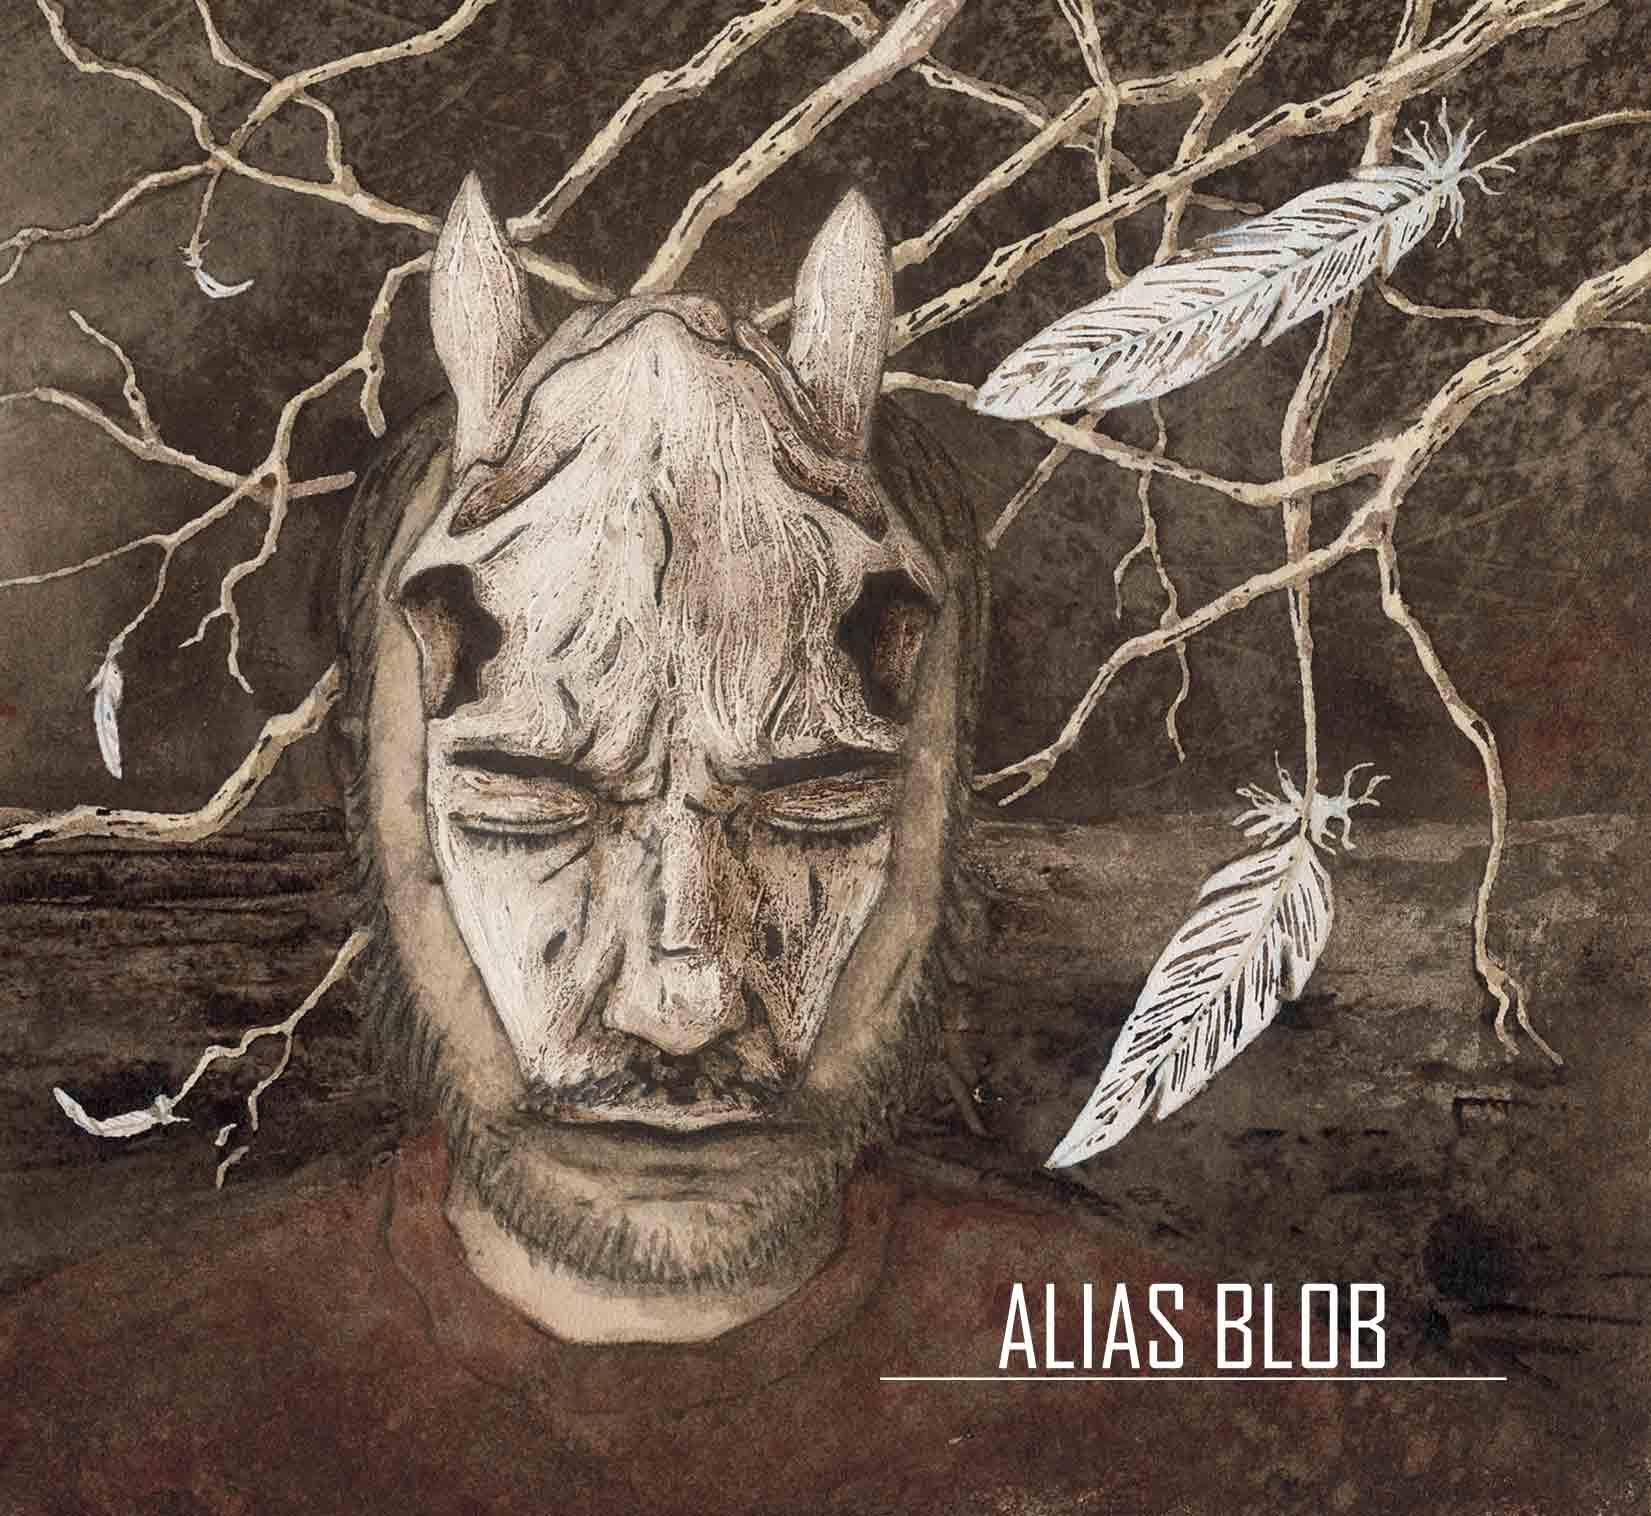 Alias Blob